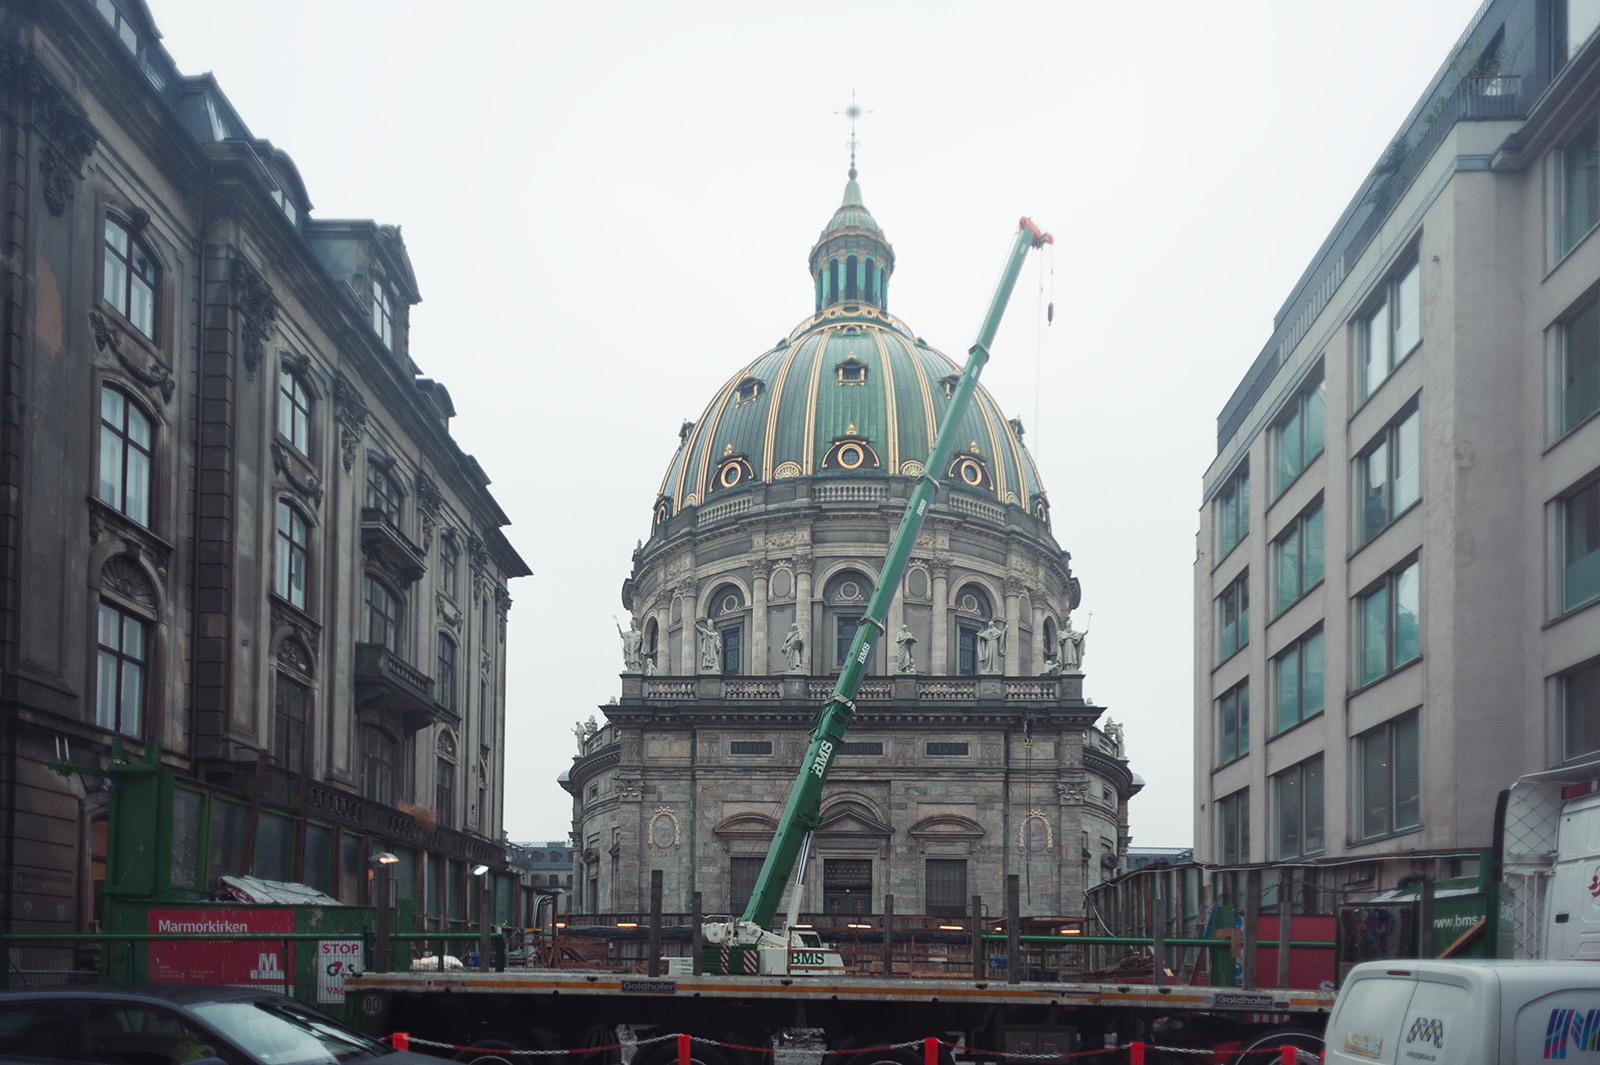 Frederiks Kirke или The Marble church